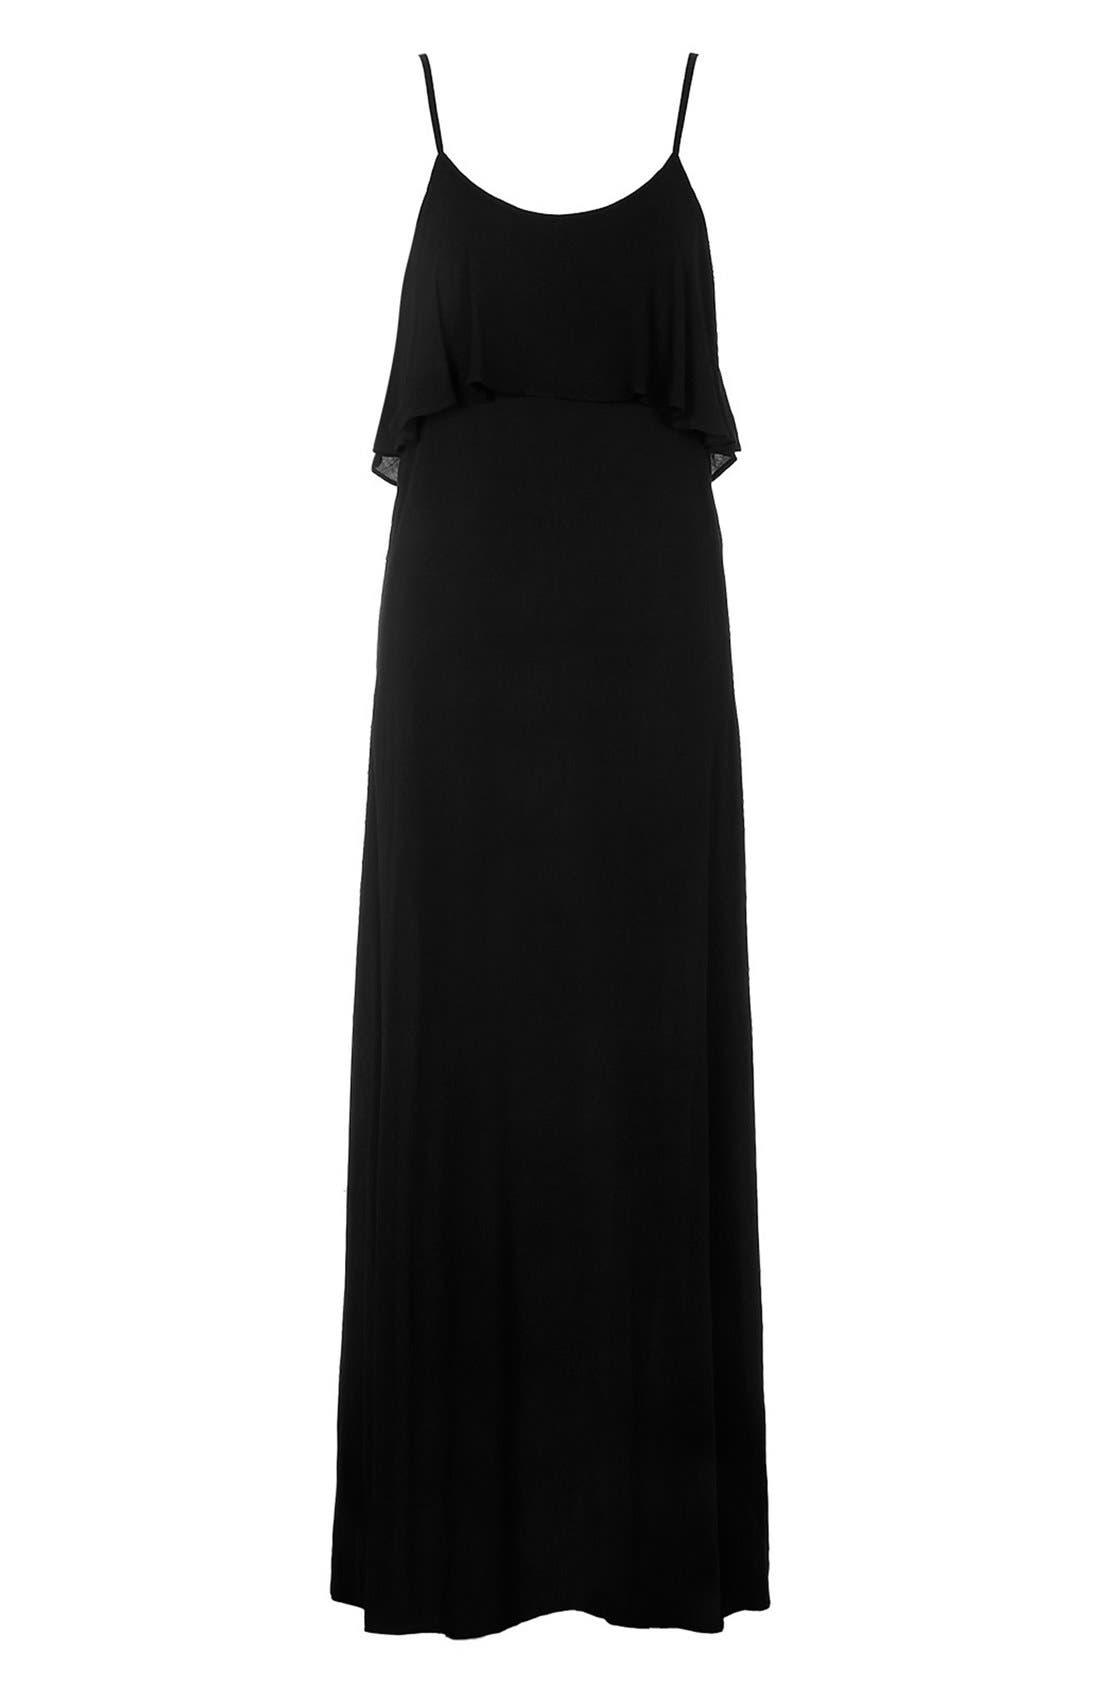 Alternate Image 3  - KENDALL + KYLIE at Topshop Layered Maxi Dress